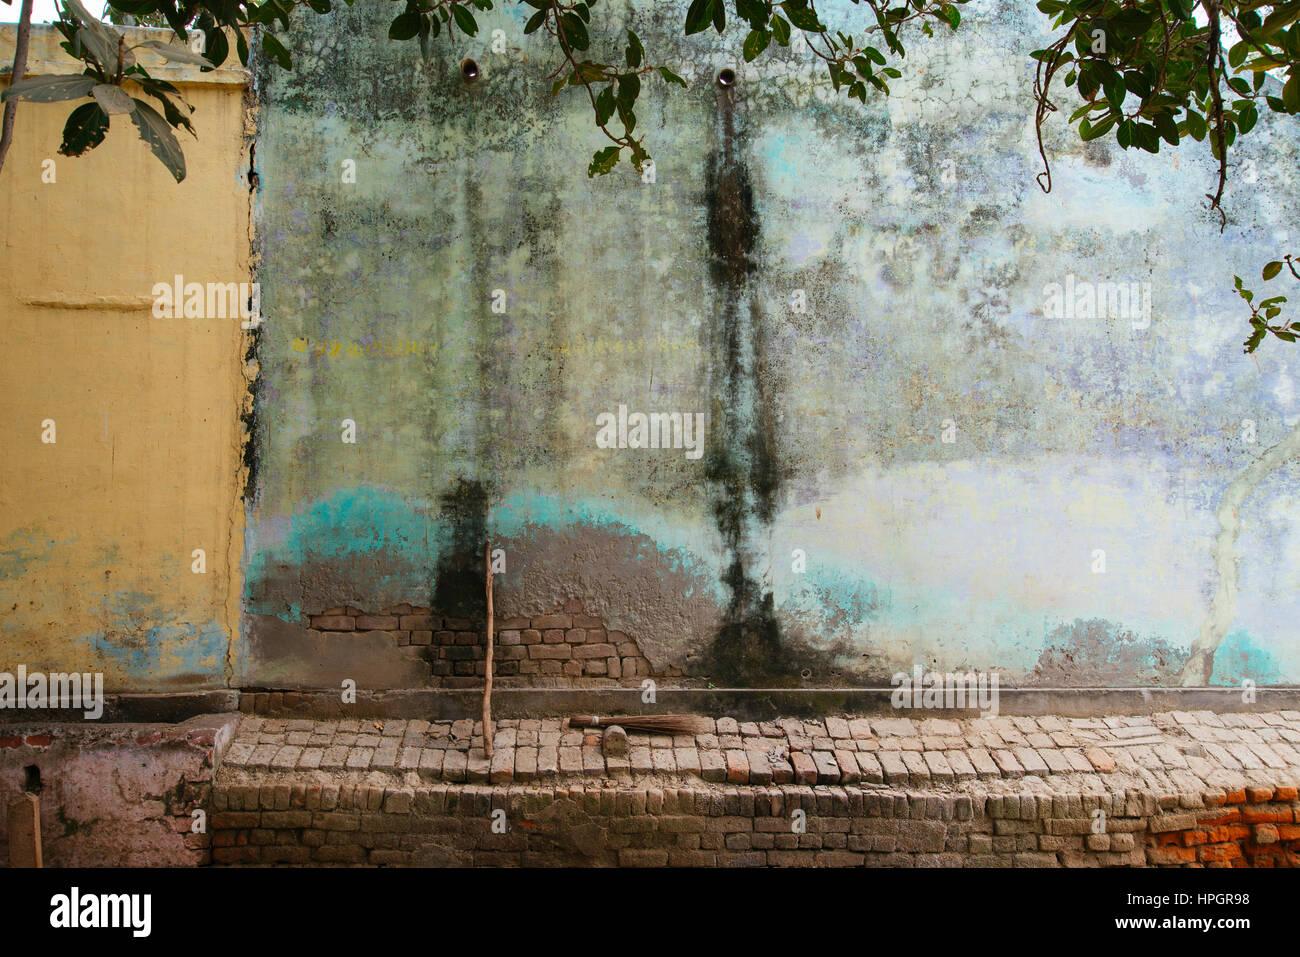 Village wall blue paint fade, India. Stock Photo